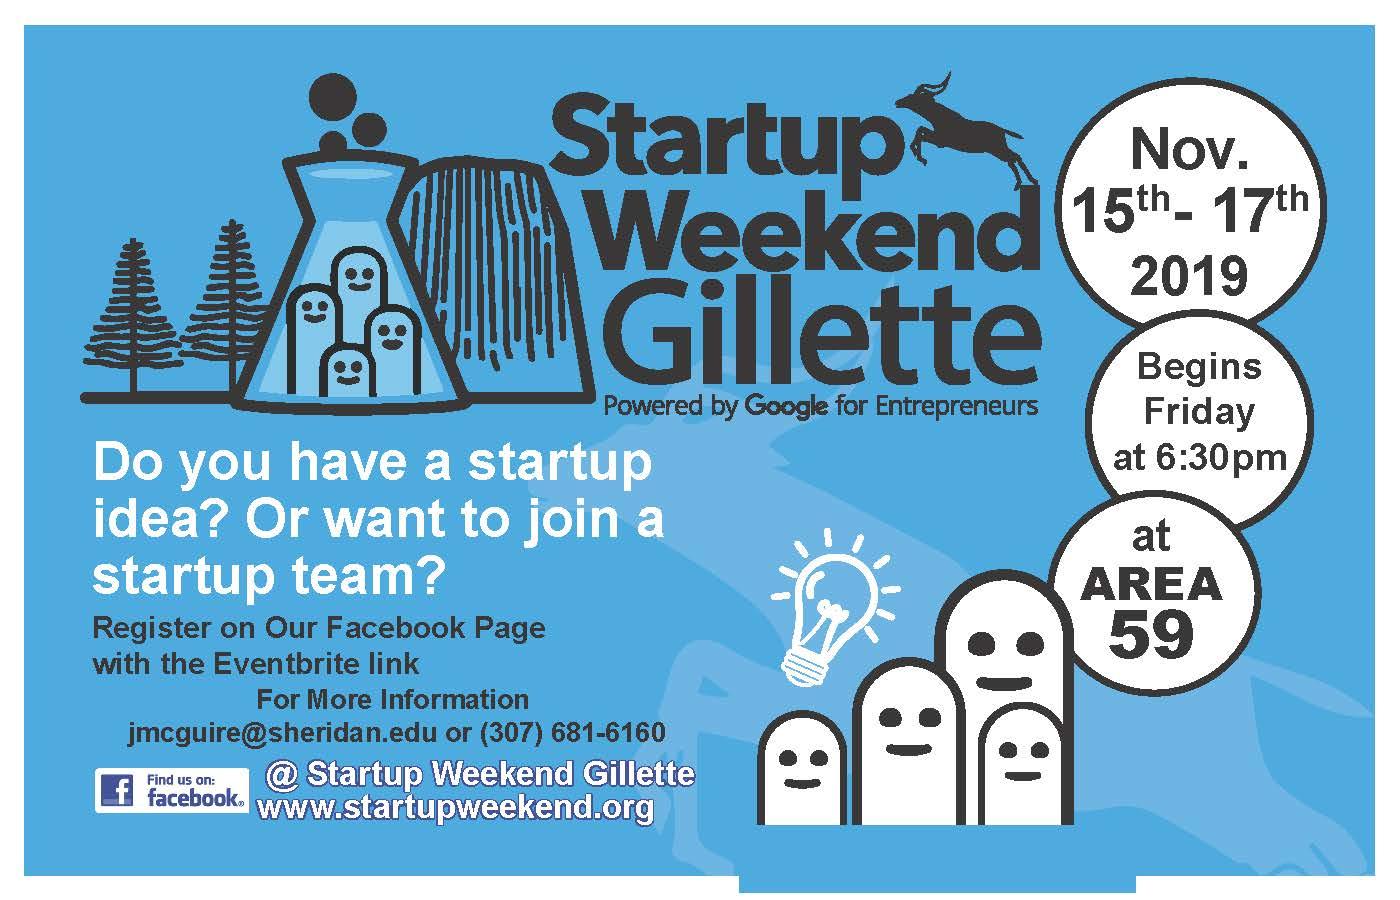 Startup Weekend Gillette